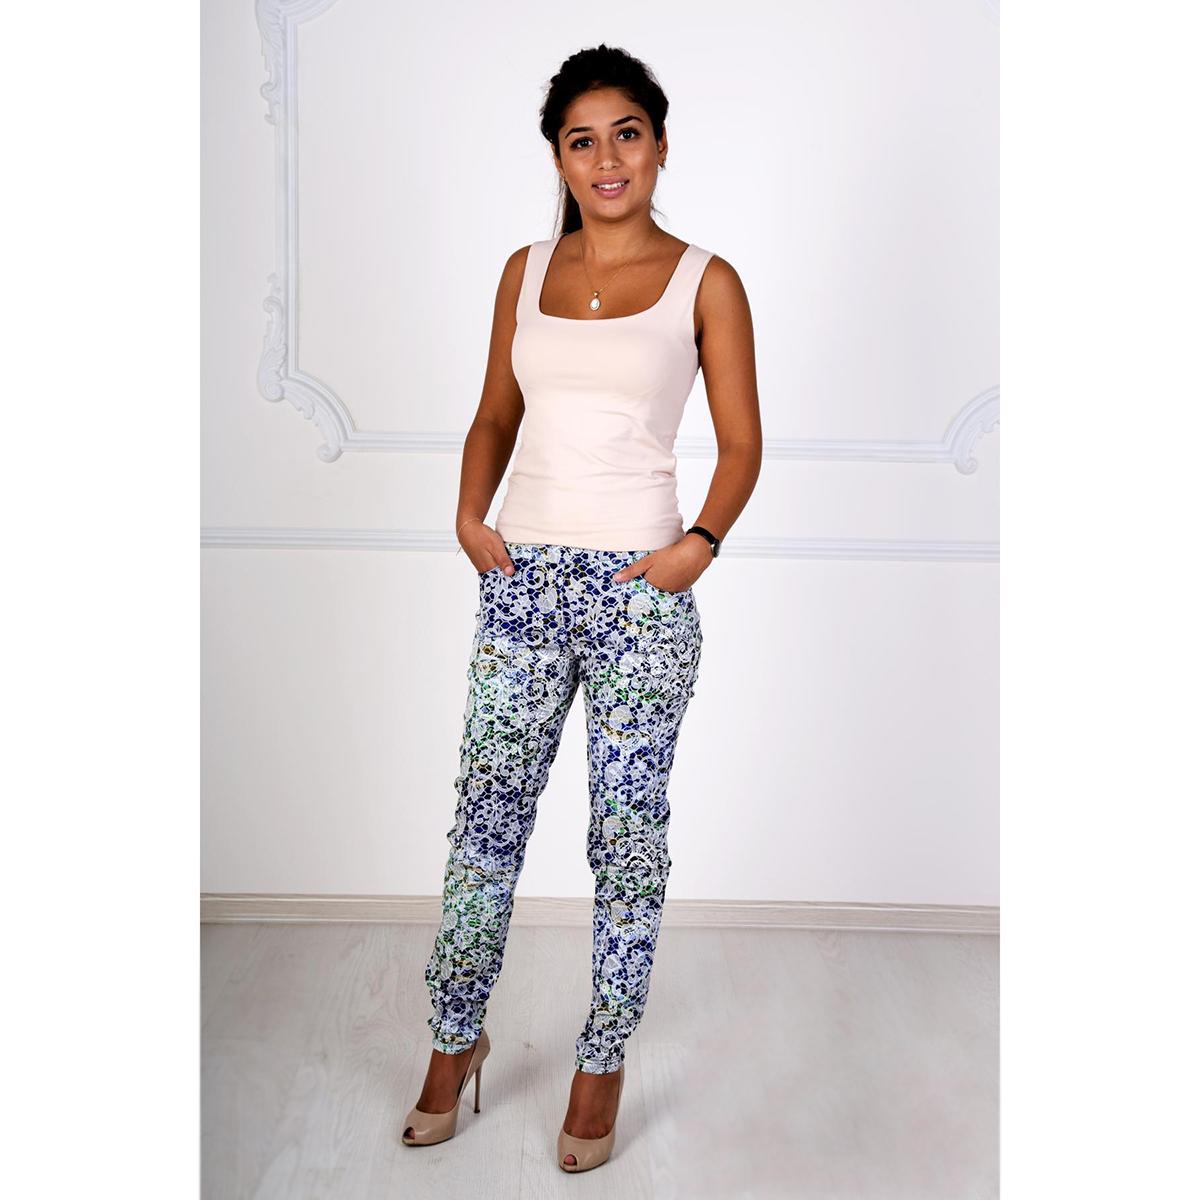 Женские брюки Жаккард арт. 0153, размер 48Брюки<br>Обхват талии:78 см<br>Обхват бедер:104 см<br>Длина по внут. шву:73 см<br>Рост:167 см<br><br>Тип: Жен. брюки<br>Размер: 48<br>Материал: Жаккард